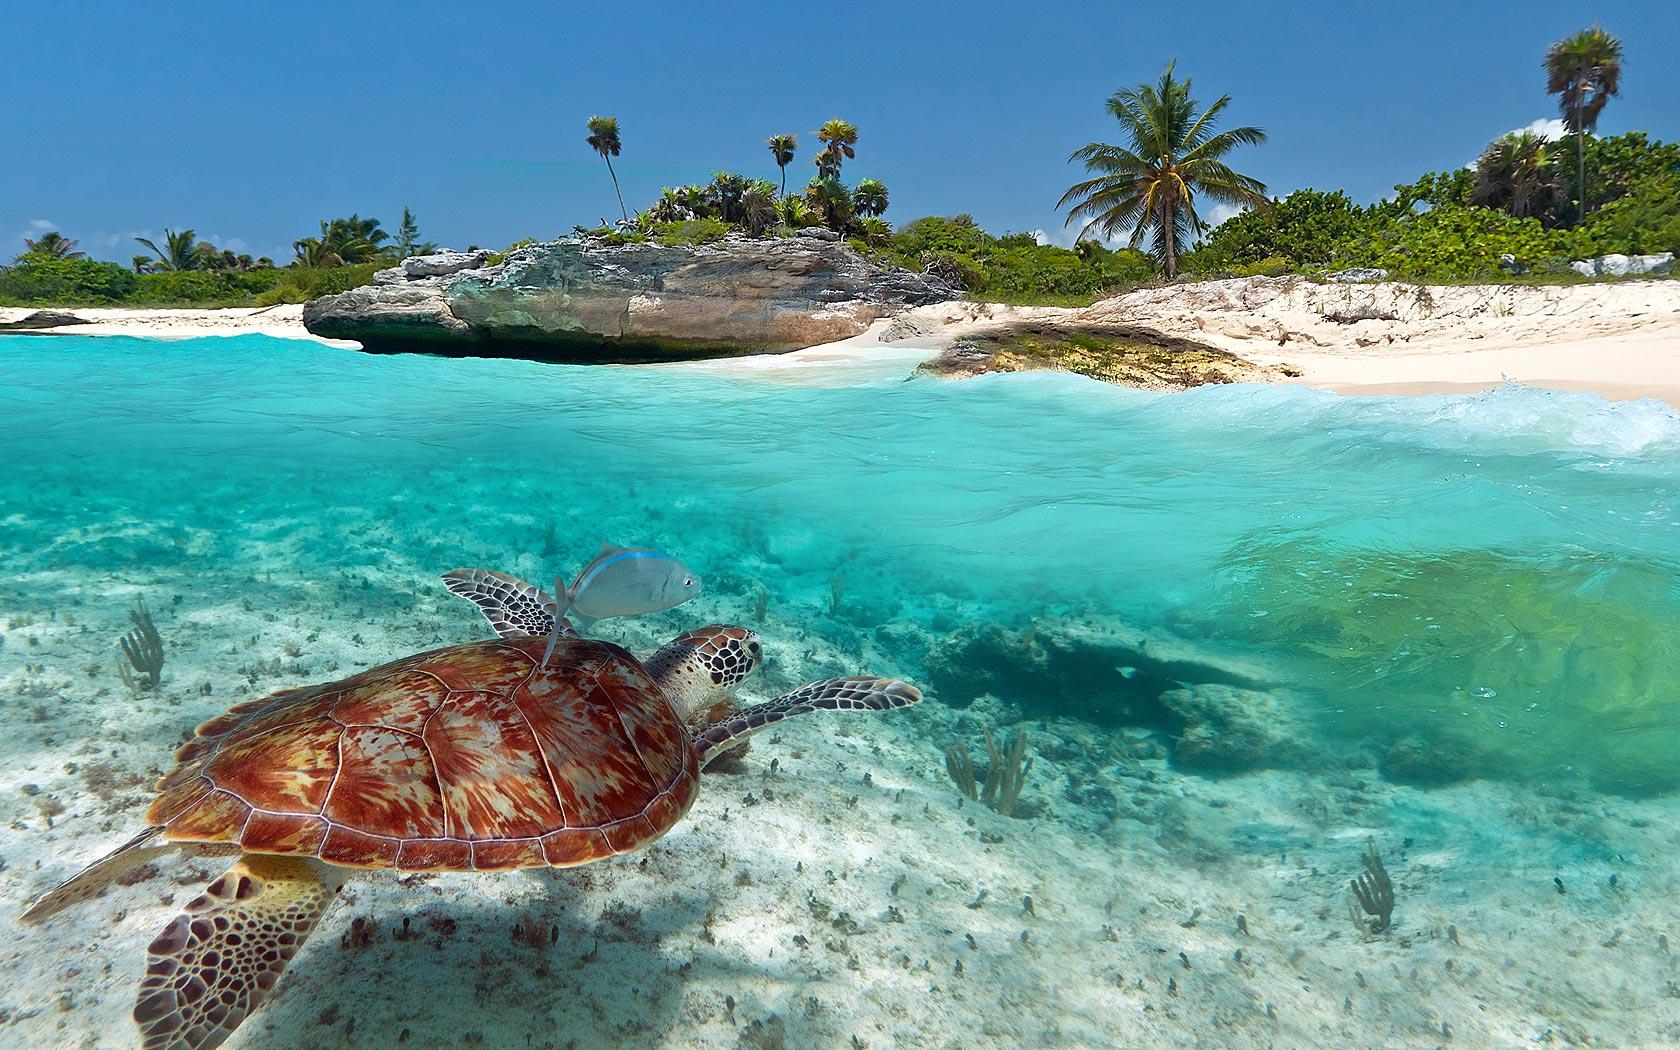 Vanuatu: Top 10 Attractions And Awesome Activities Of Espiritu Santo